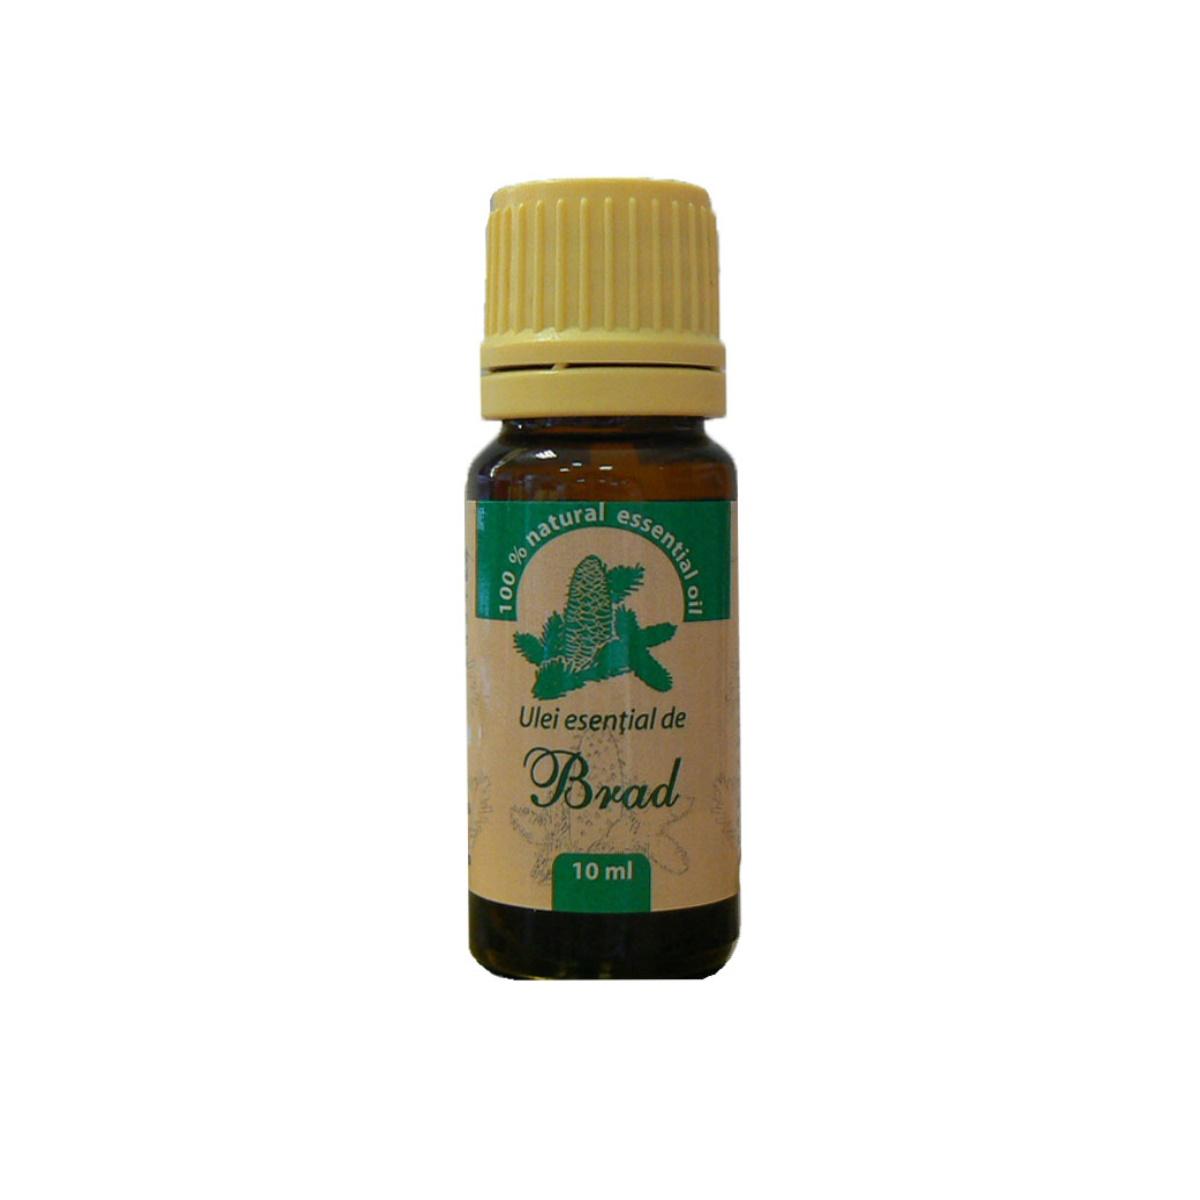 Ulei esential de Brad, 10 ml, Herbavit